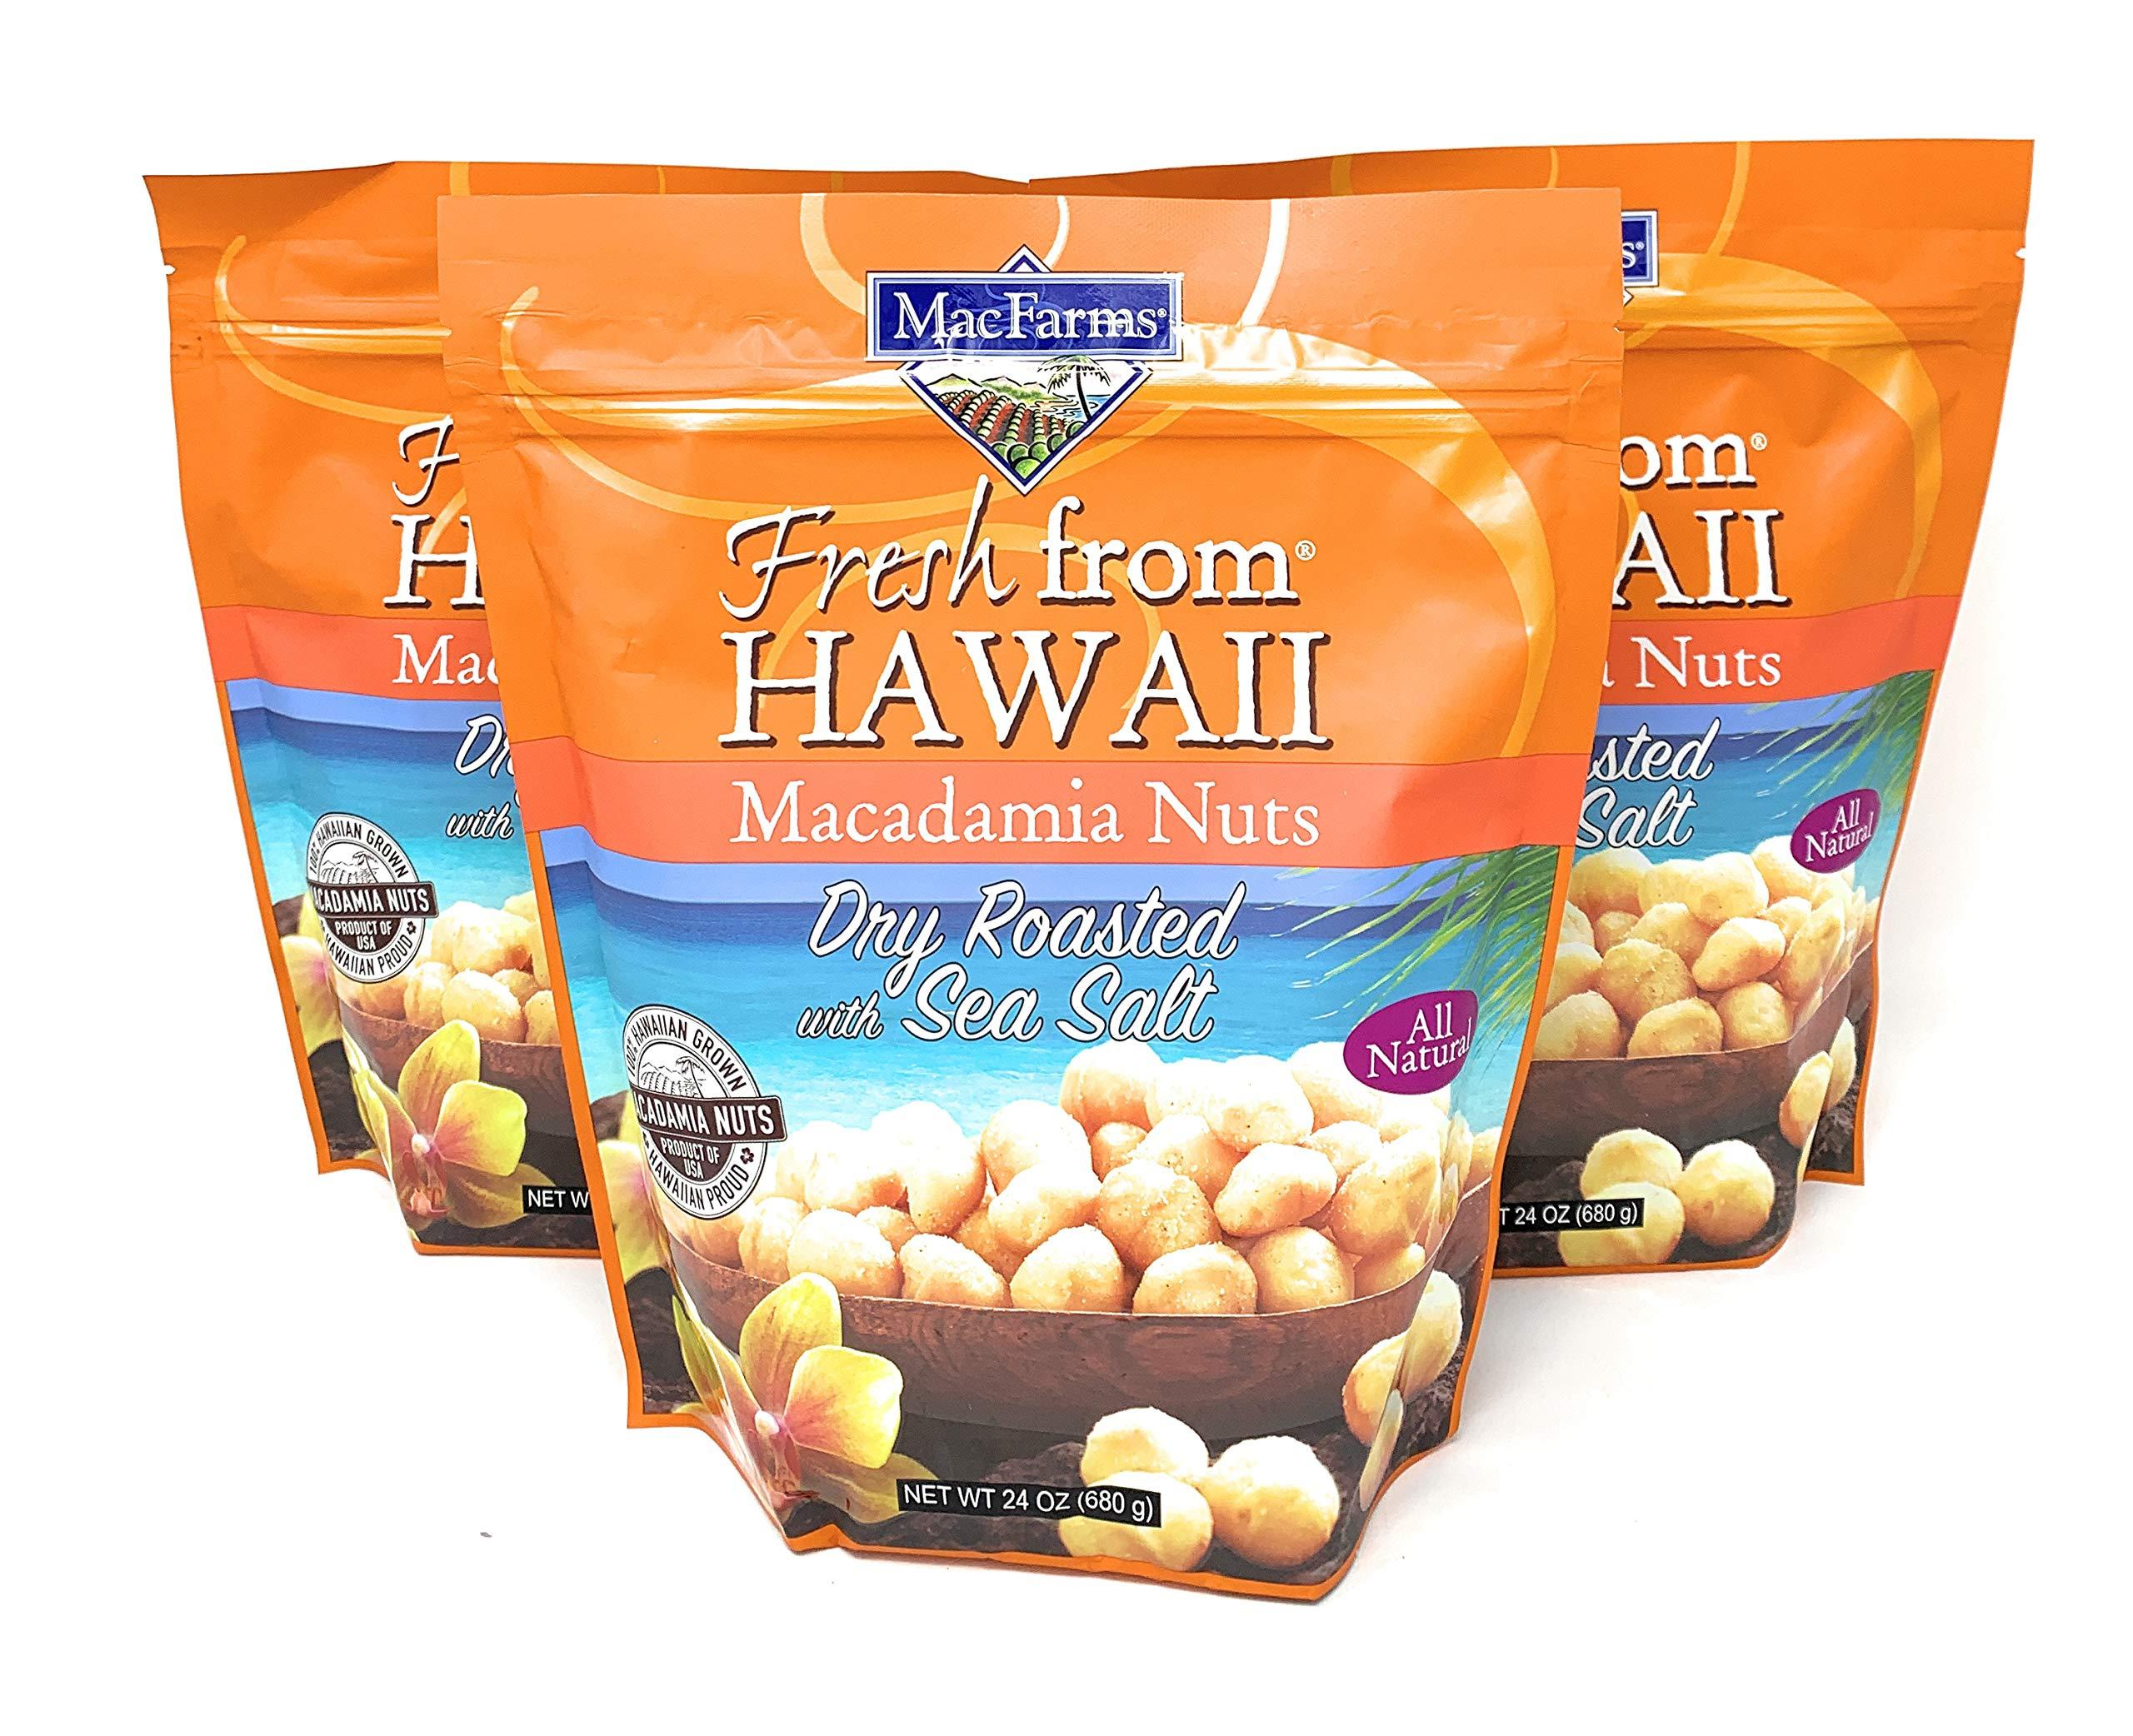 MacFarms Dry Roasted Macadamia Nuts With Sea Salt Fresh From Hawaii 24 Ounce (3 Pack) by MacFarms (Image #2)